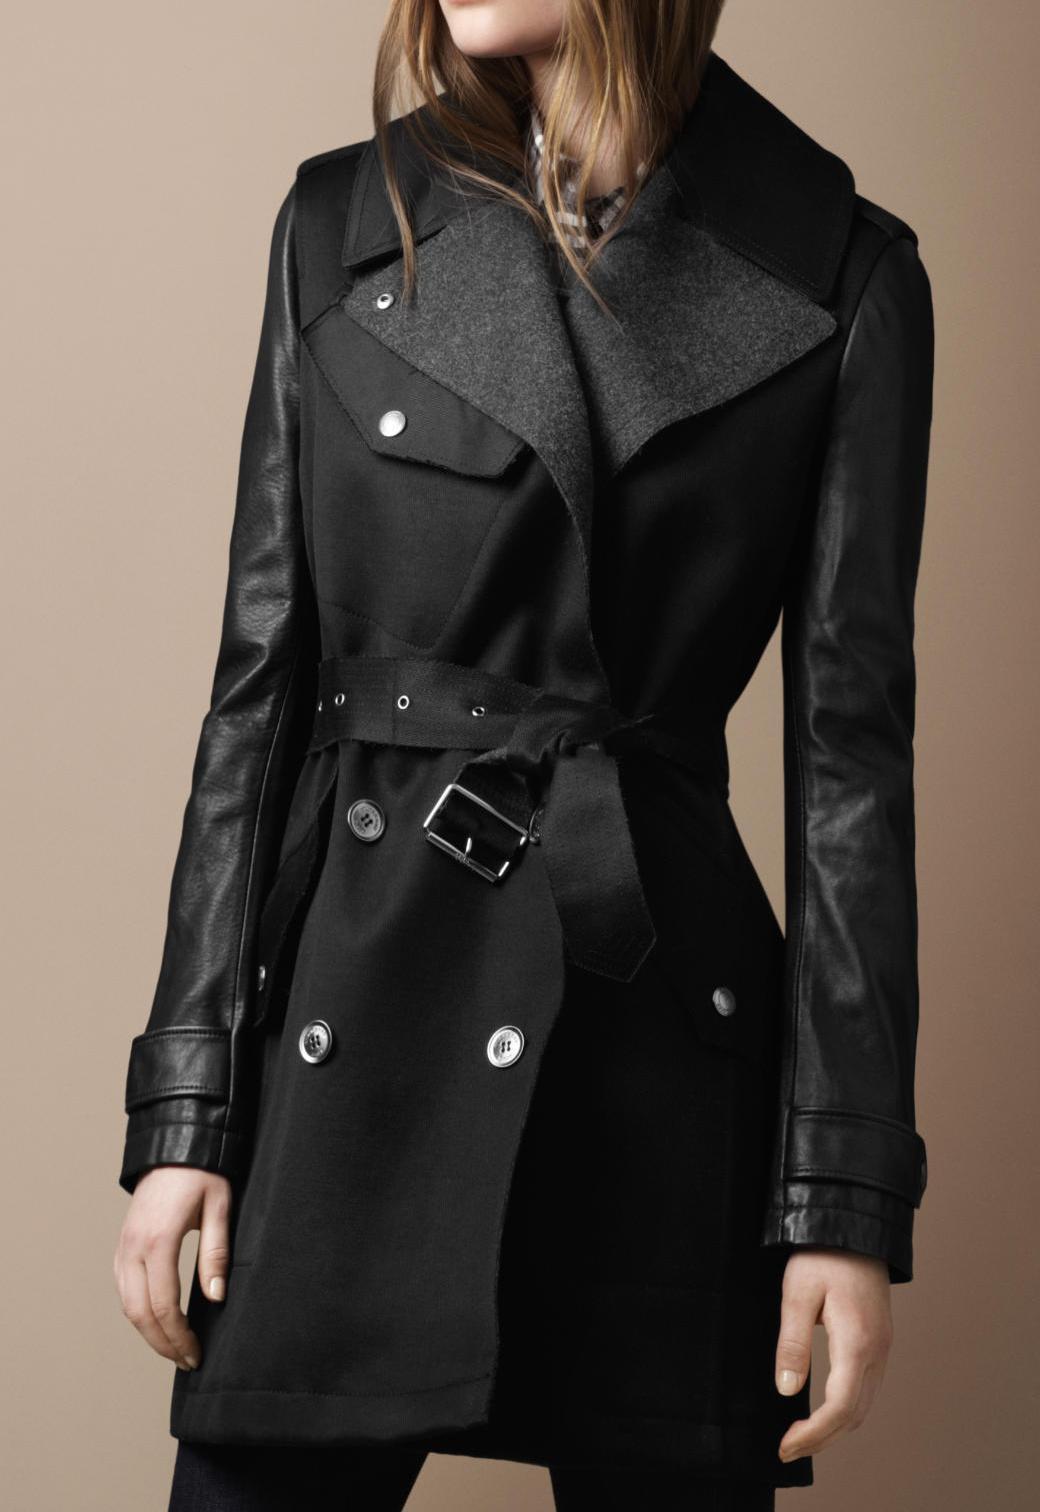 burberry巴寶莉 brit系列女裝/風衣 腰帶雙排扣 38431061美國代購圖片